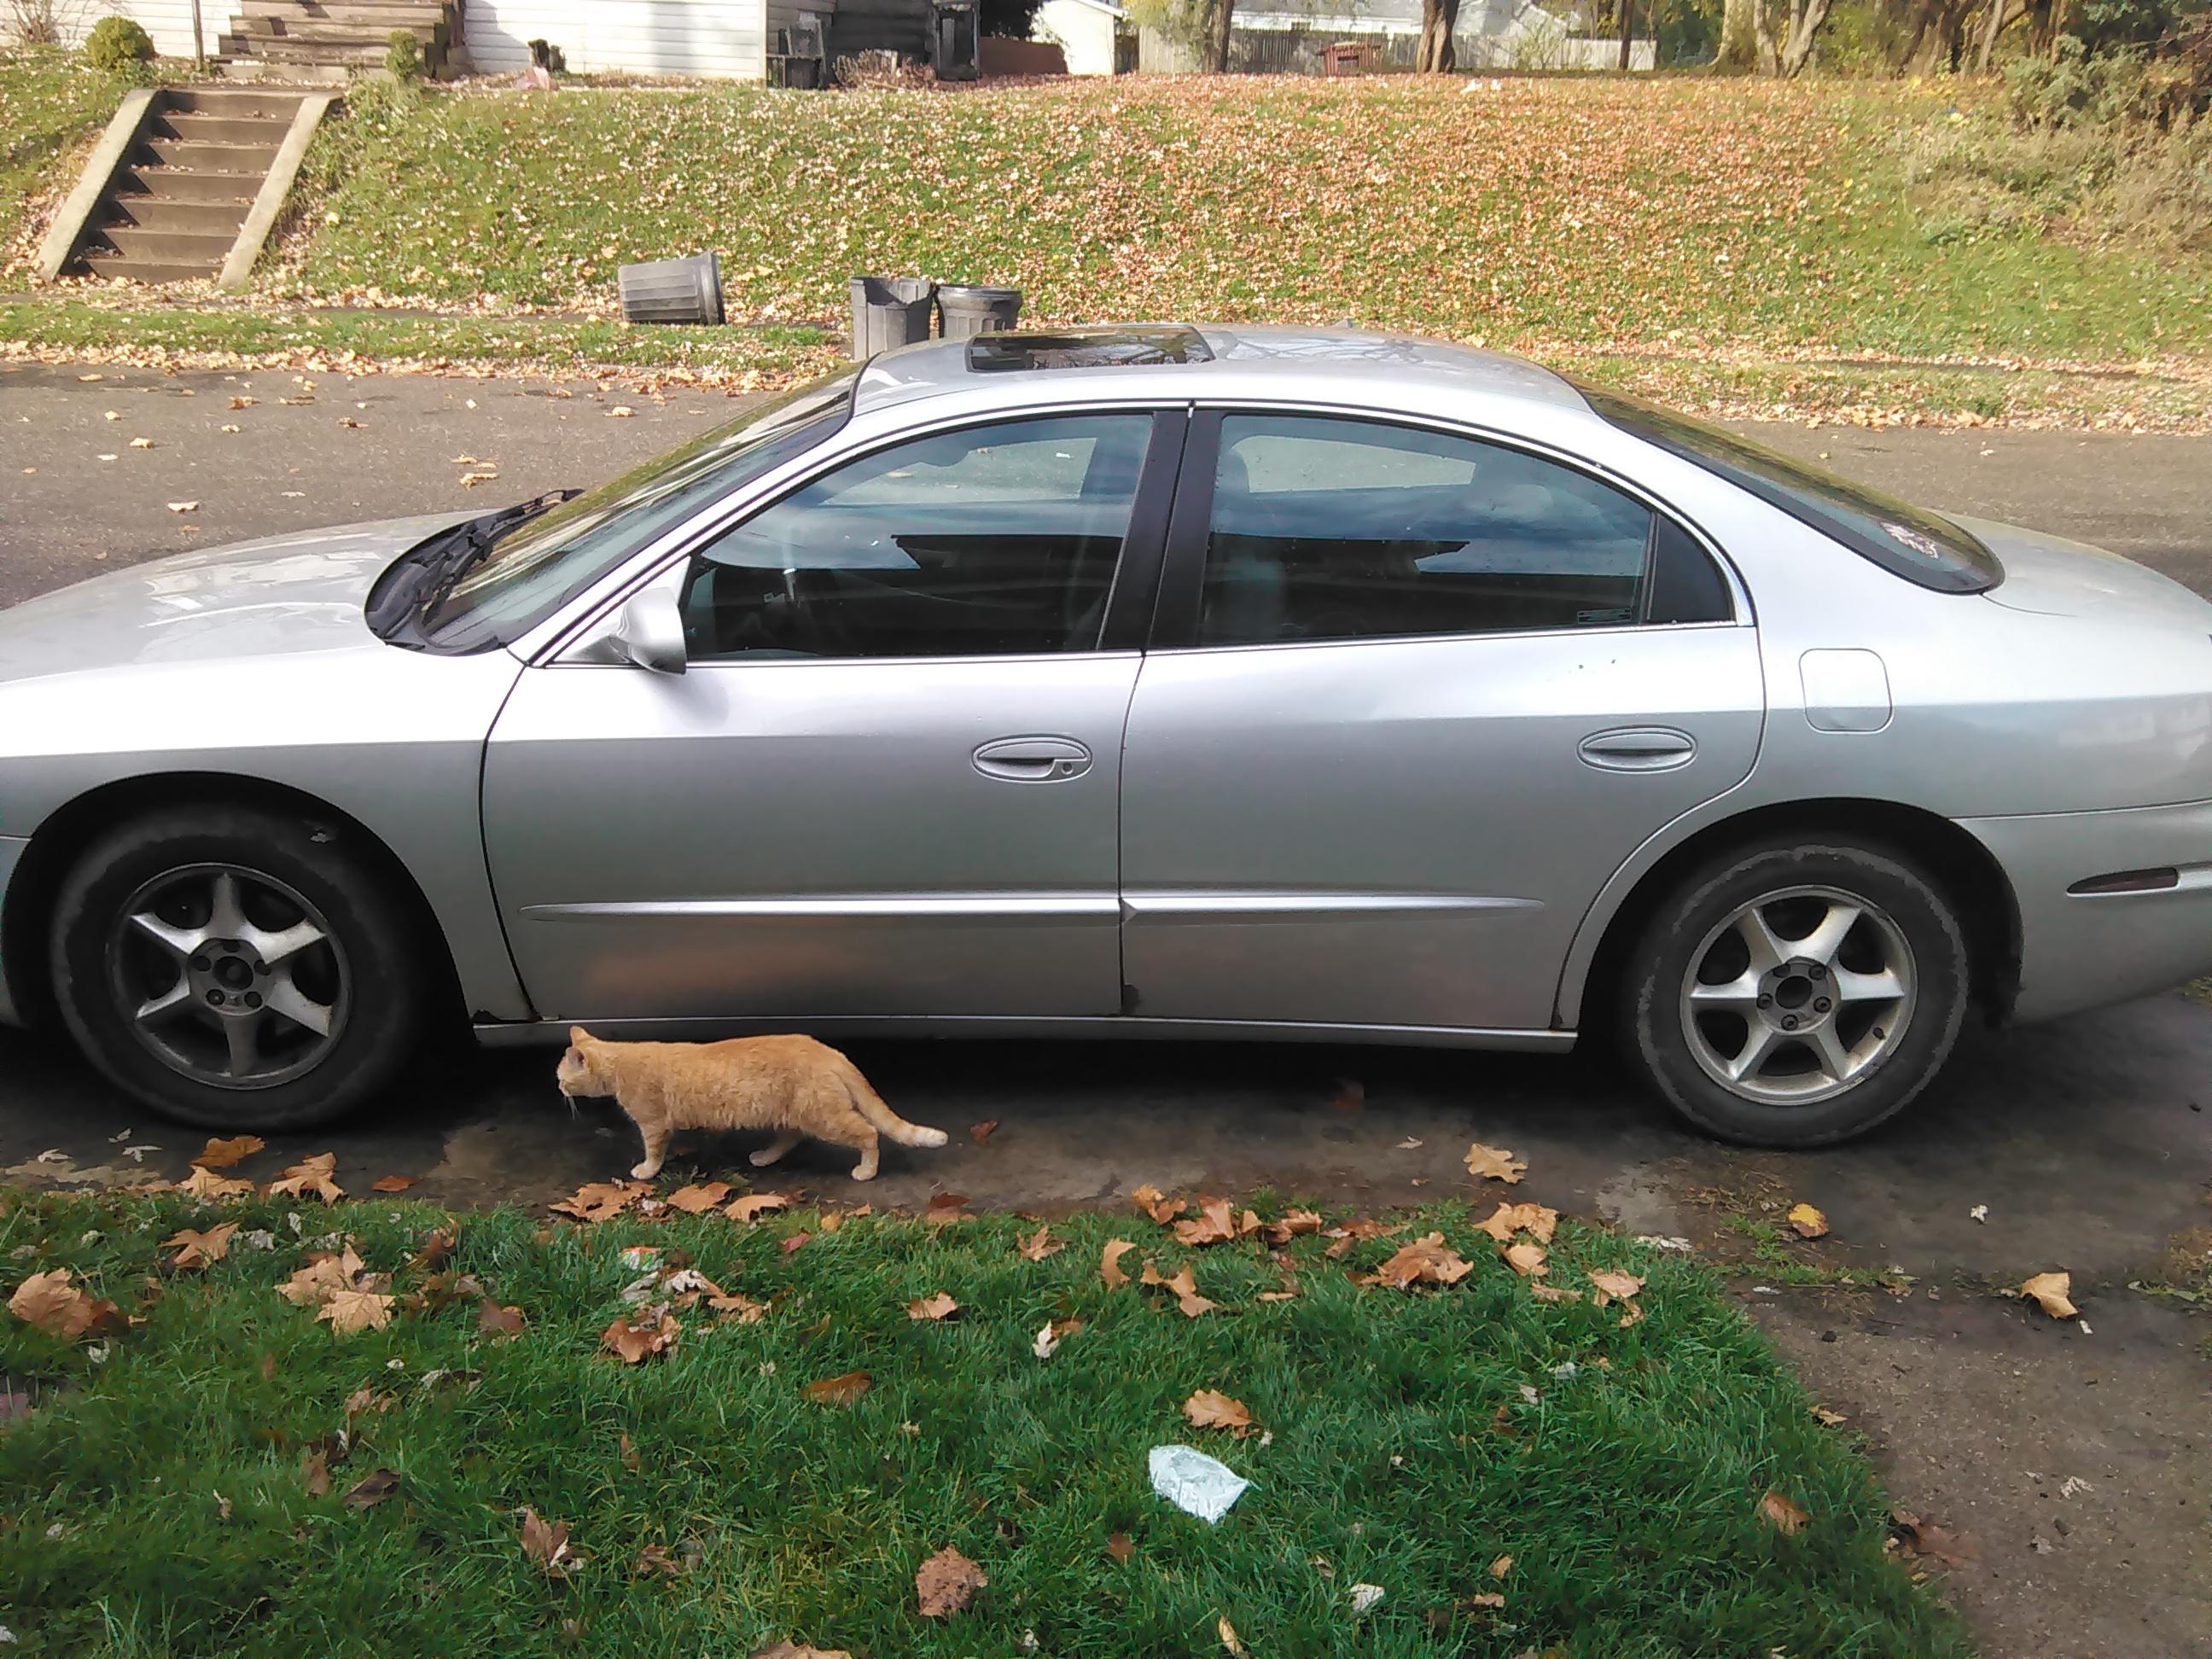 Cash for Cars Roanoke, VA | Sell Your Junk Car | The Clunker Junker